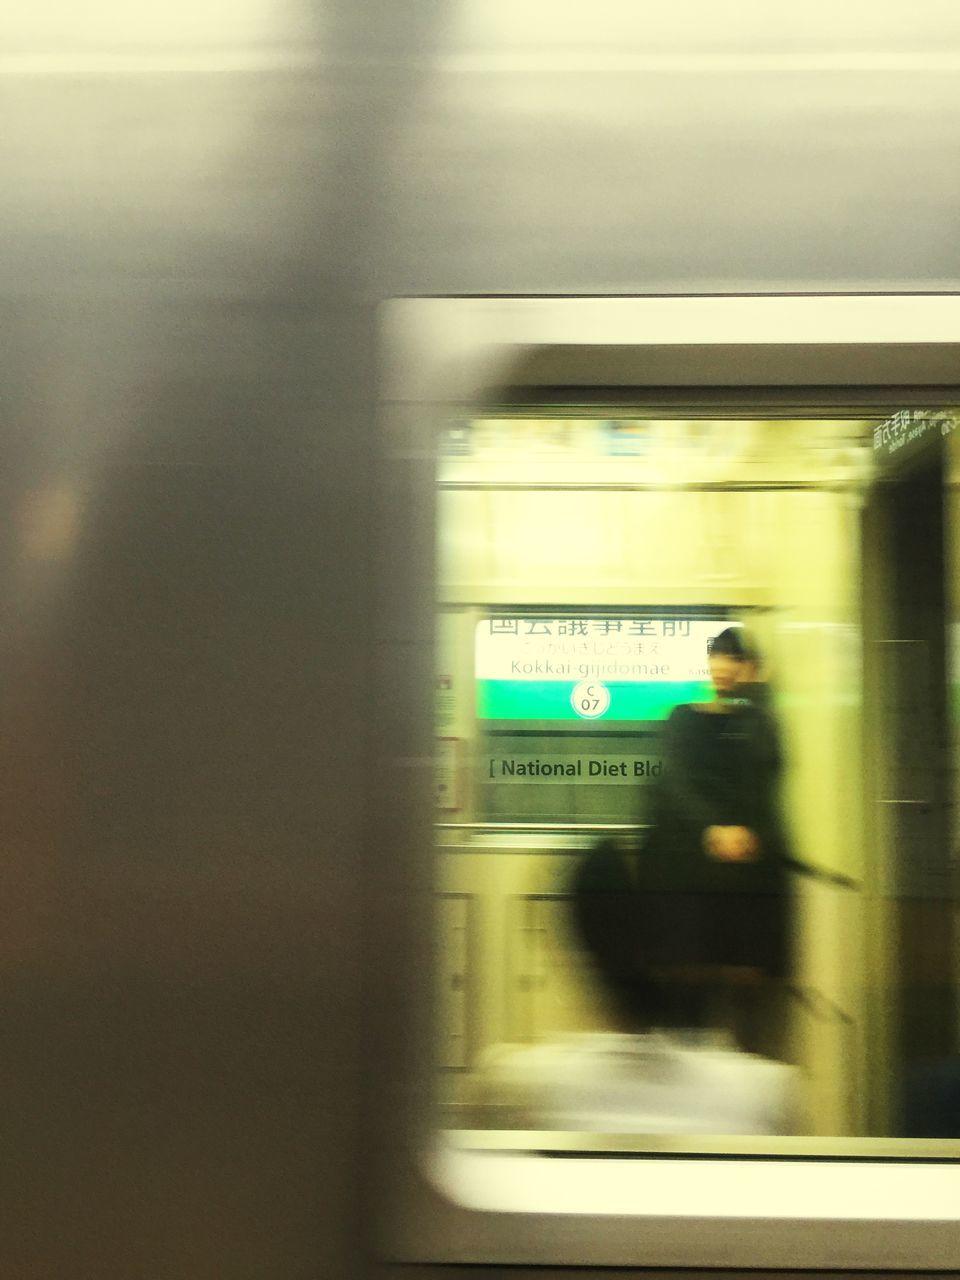 transportation, blurred motion, real people, public transportation, train - vehicle, mode of transport, speed, motion, passenger train, men, passenger, rail transportation, indoors, railroad station, journey, illuminated, one person, subway train, women, lifestyles, day, people